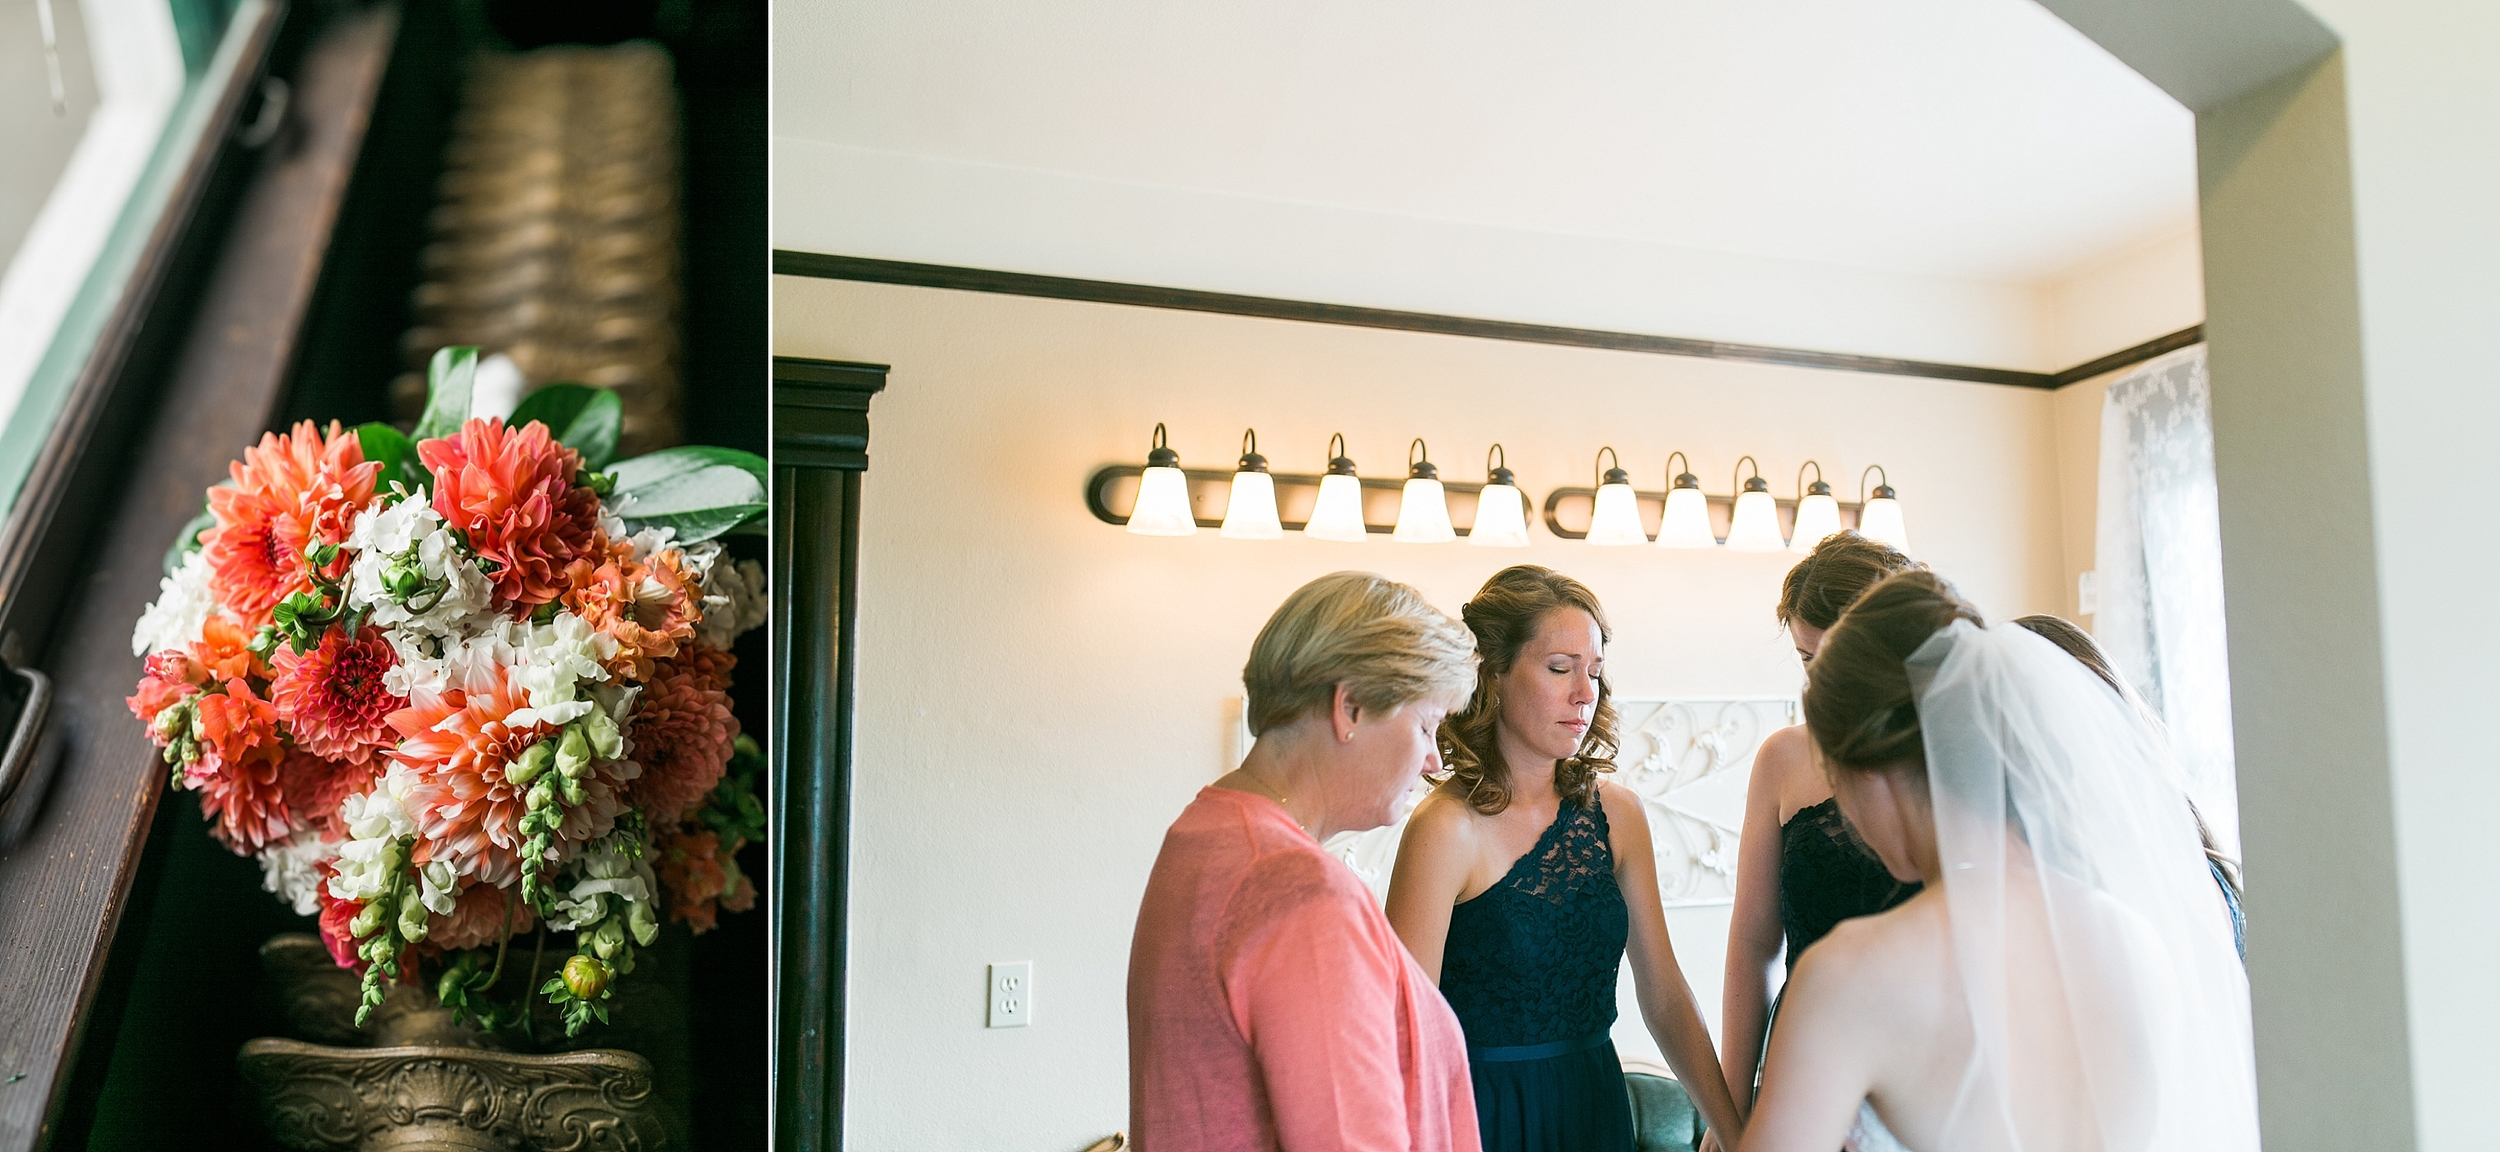 ashley vos photography seattle area wedding photographer_0665.jpg